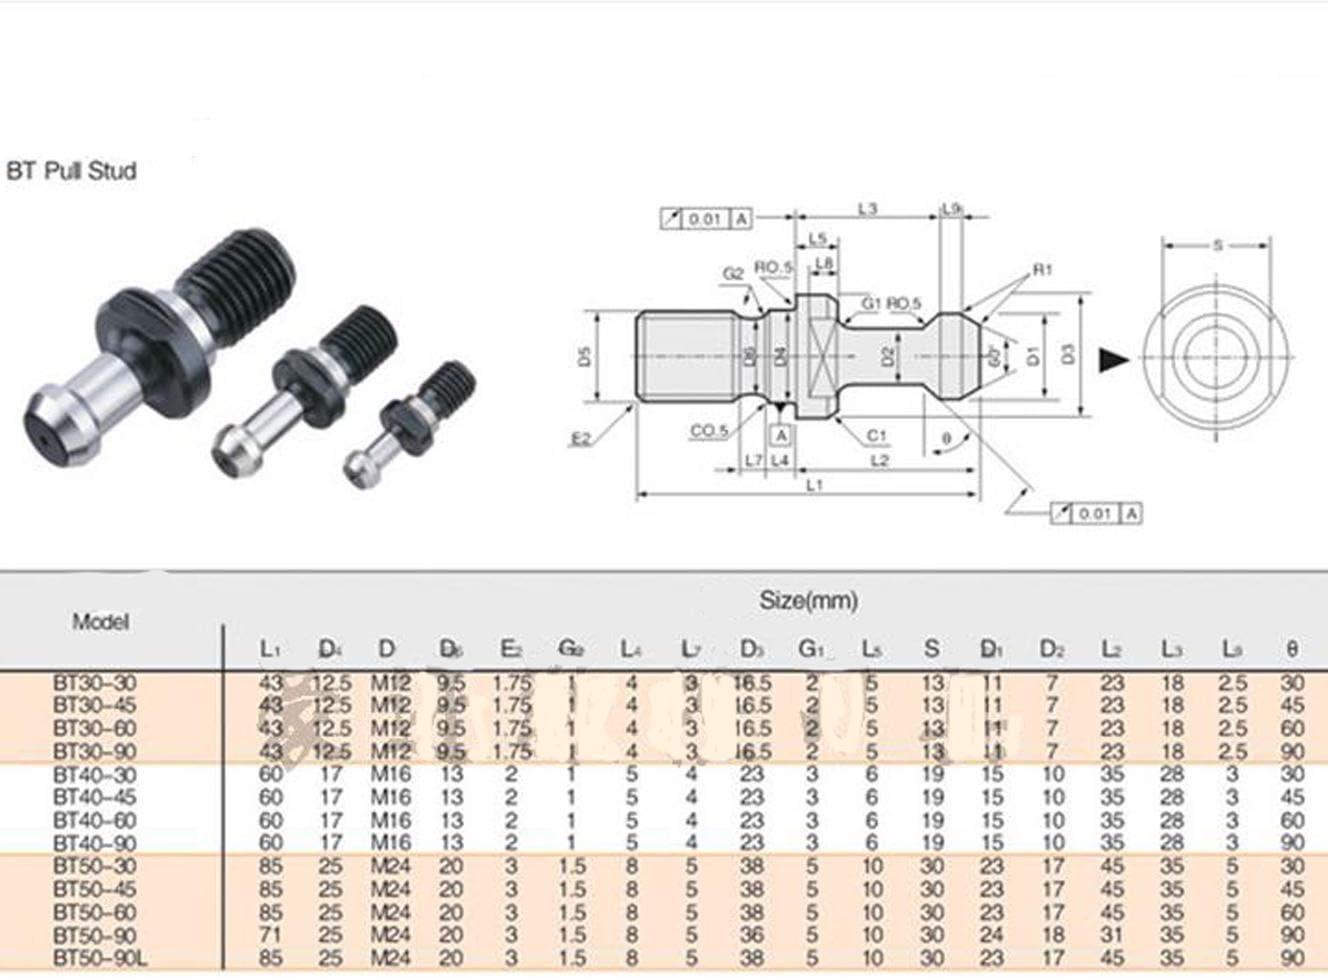 2X BT40 45 Degree M16 Pull Stud Retention Knob CNC Milling Tool Holder Yodaoke